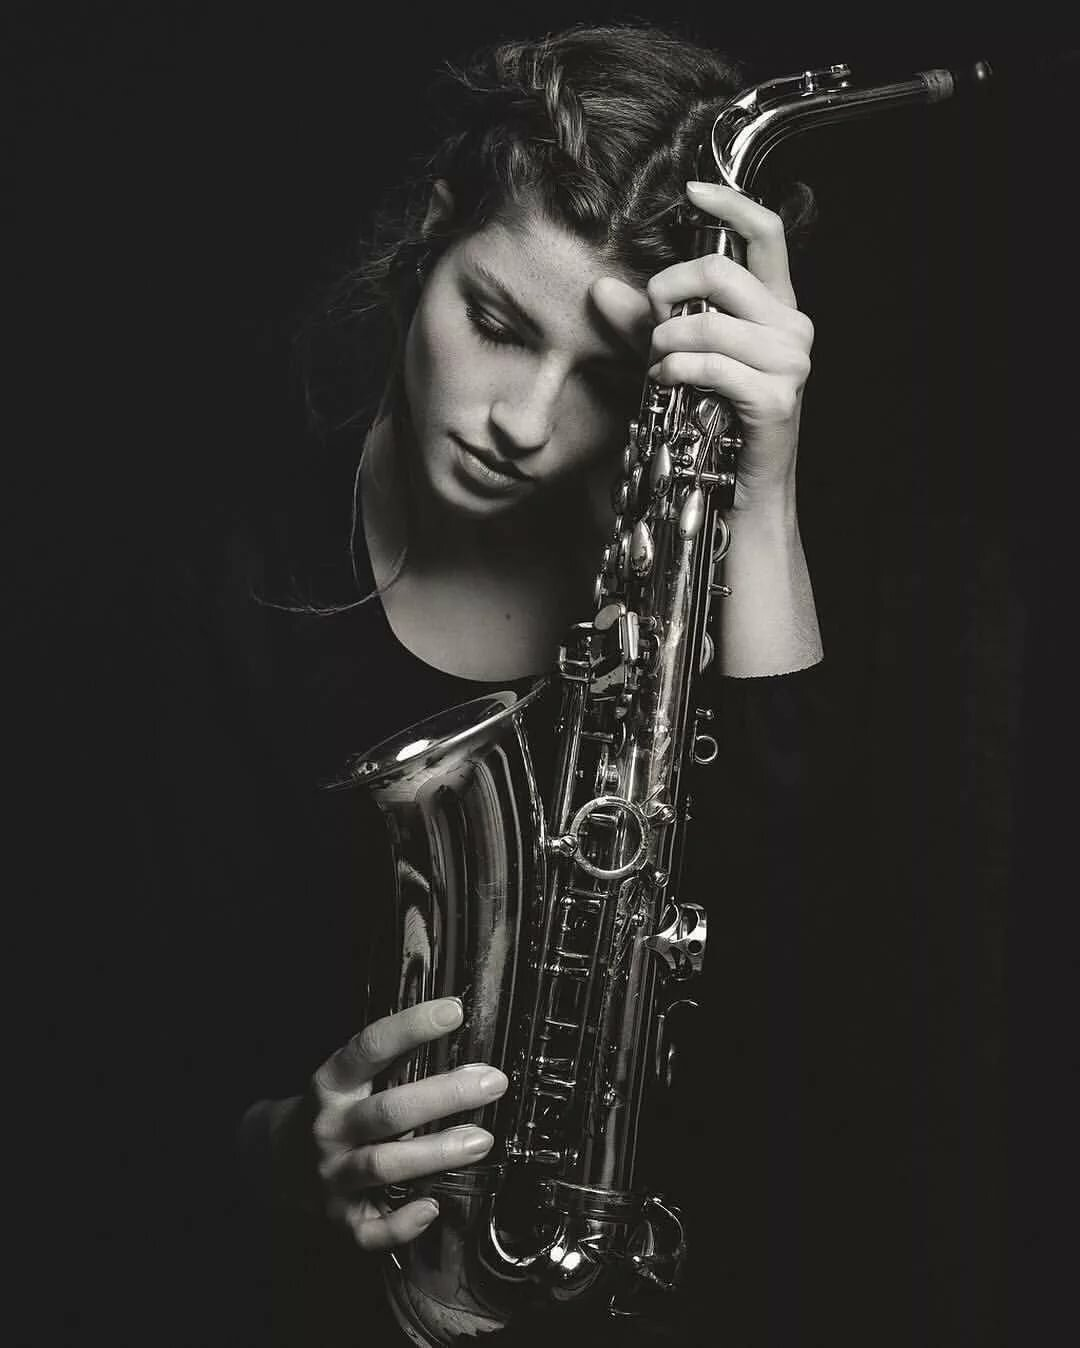 фотосессия с саксофоном идеи